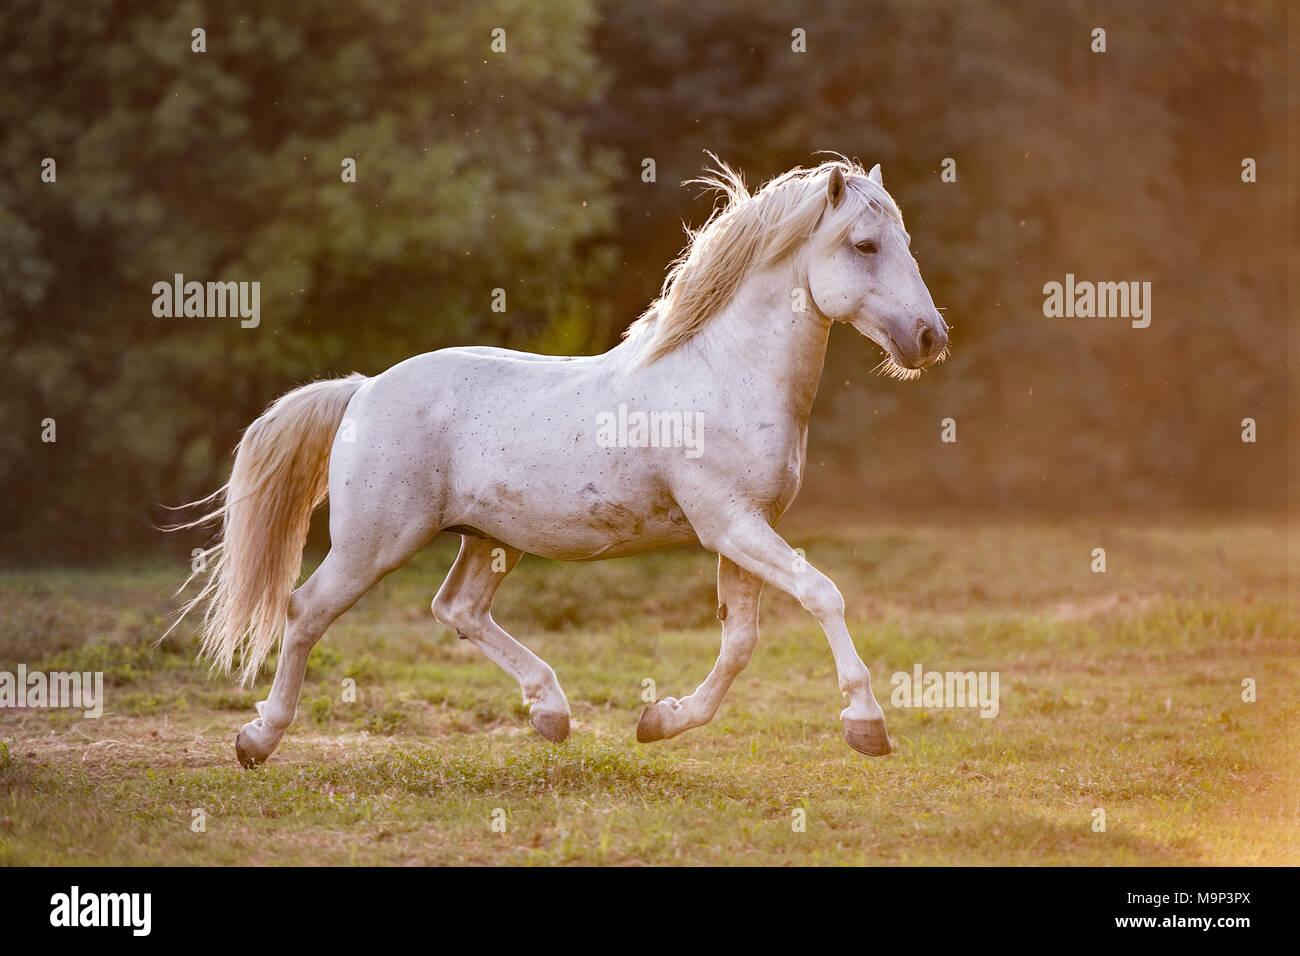 Semental de Camarga (Equus) al trote a través de la pradera al atardecer, Stallion, Francia Imagen De Stock